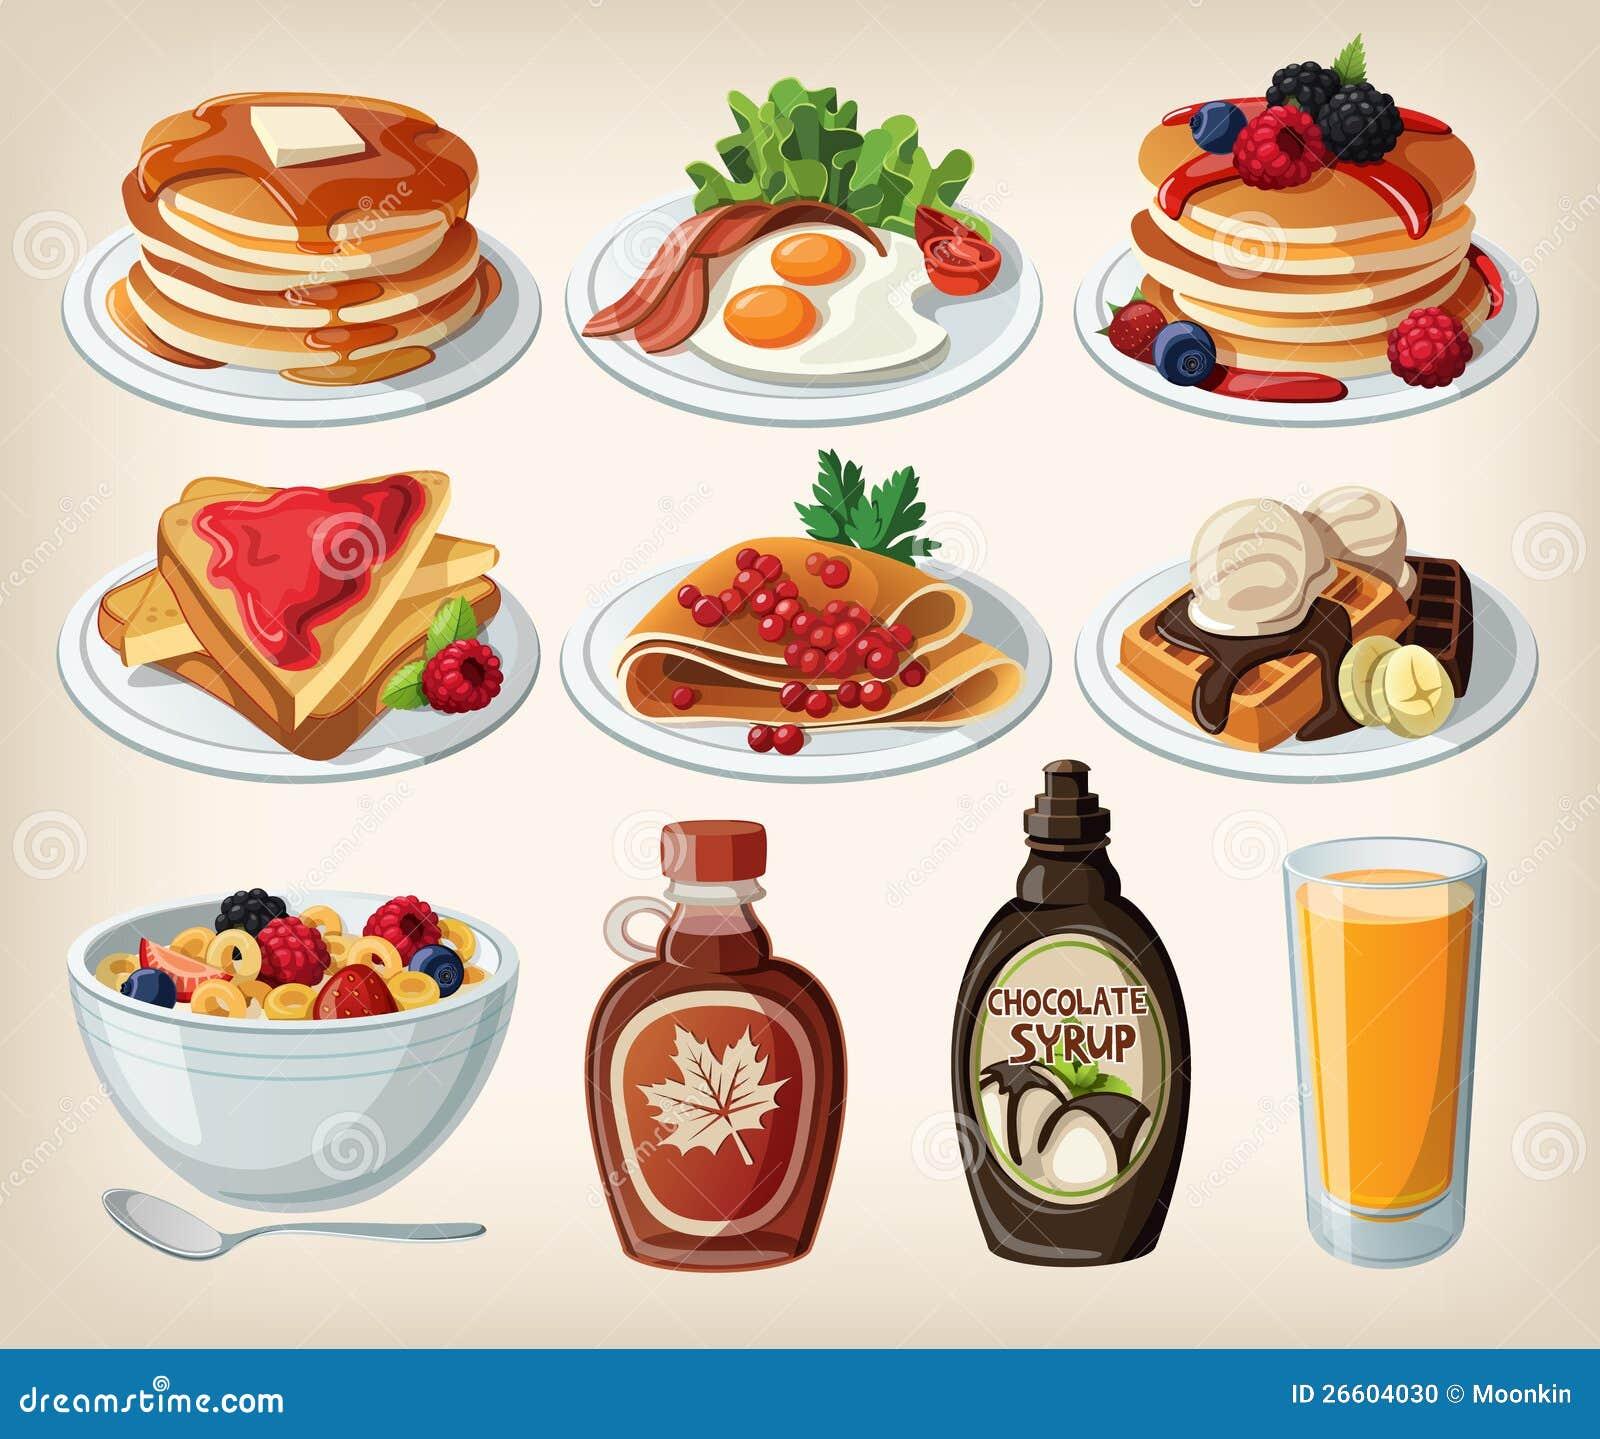 Classic breakfast cartoon set with pancakes, cerea